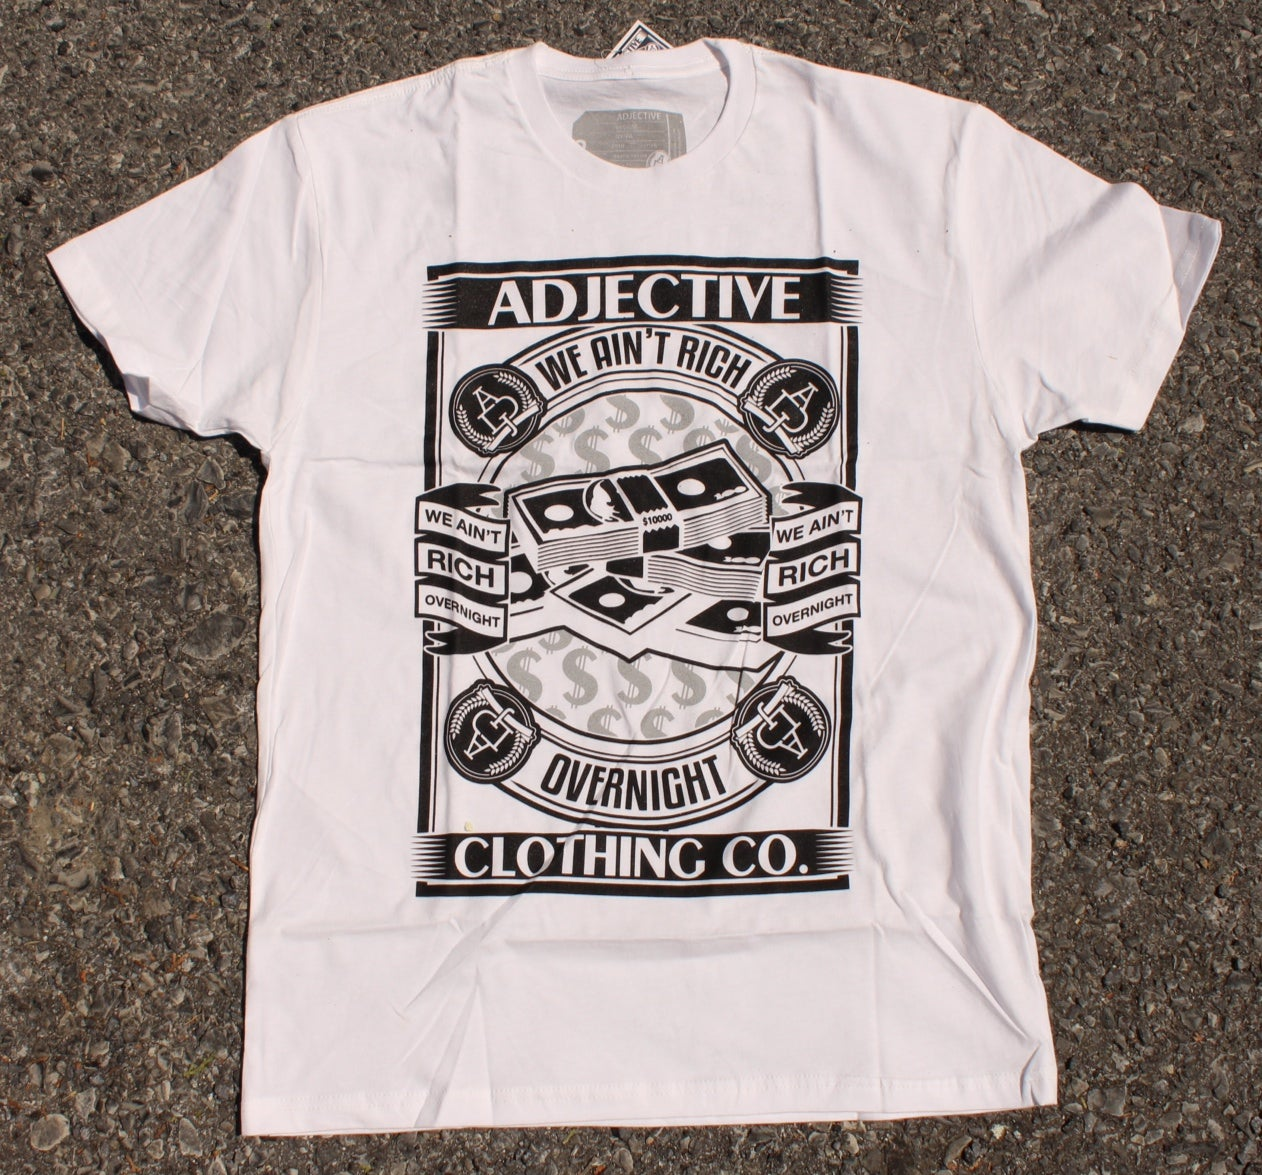 Image of Rich Overnight T-shirt